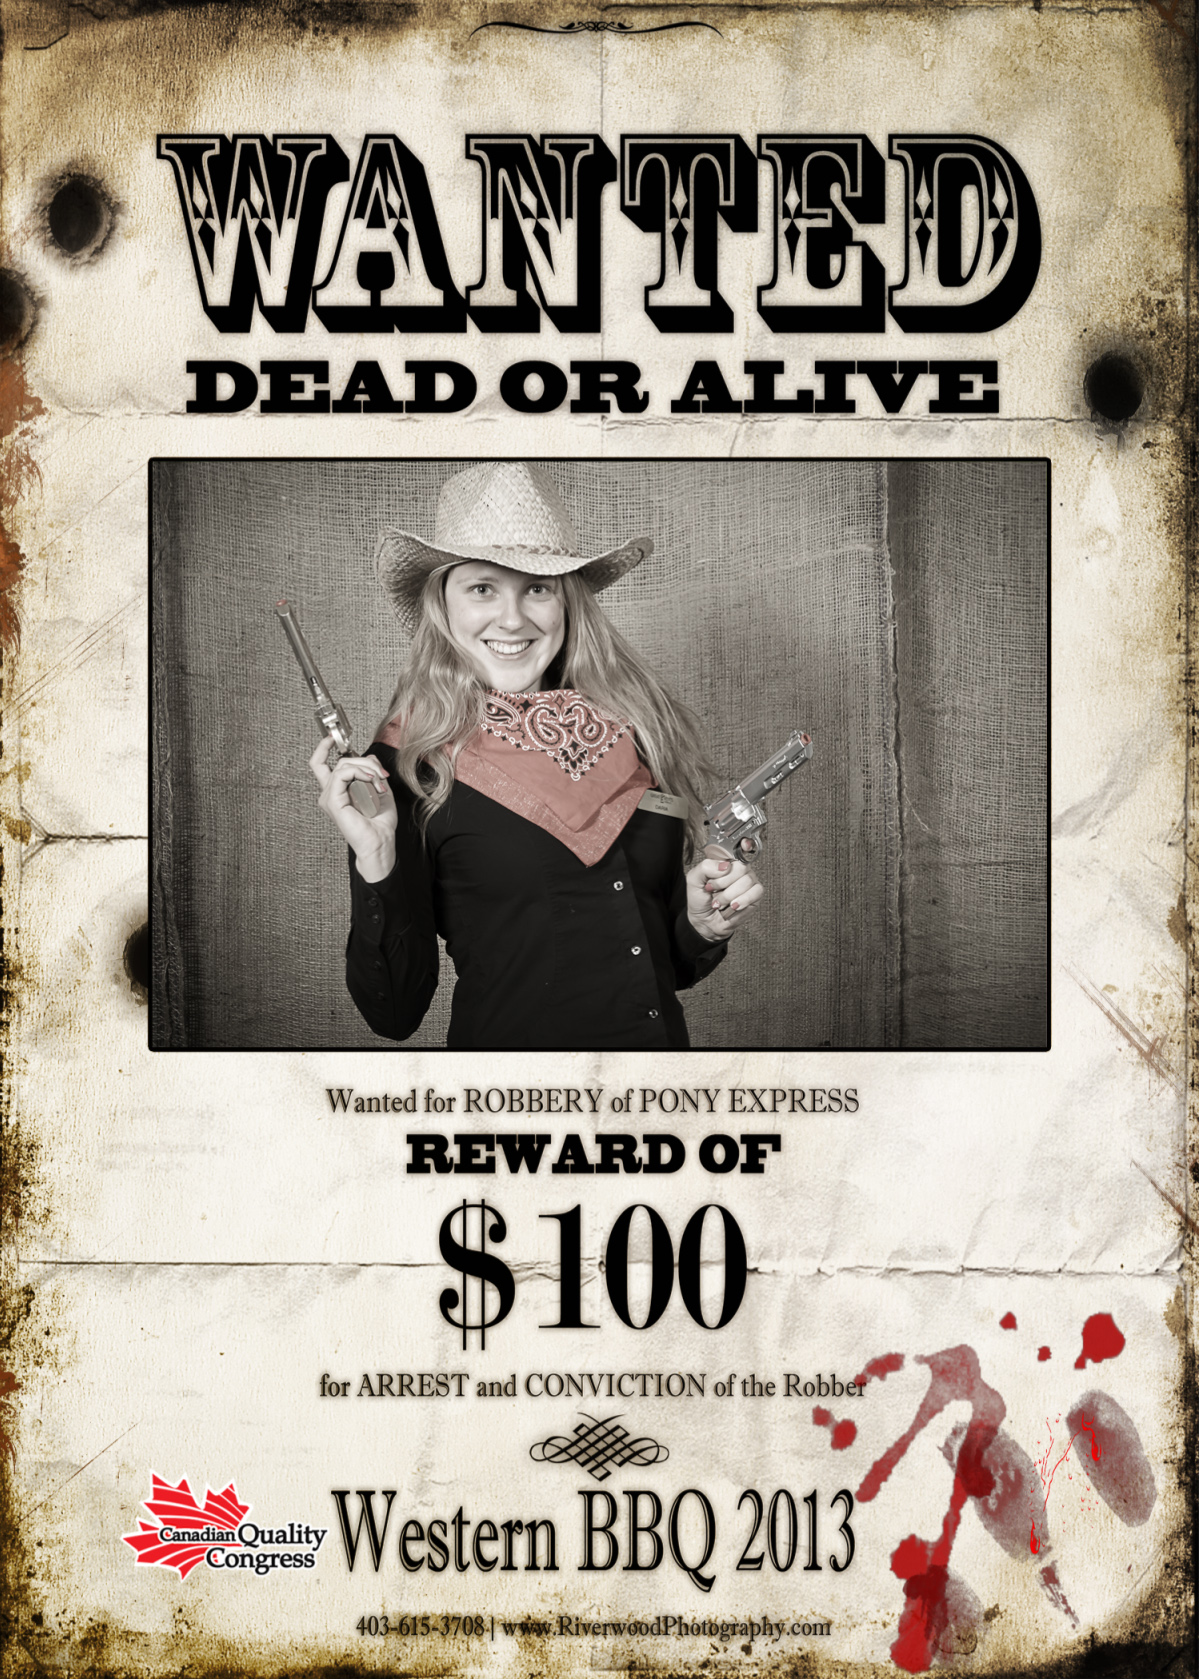 The Calgary Stampede Is Only 6 Weeks Away 403 615 3708